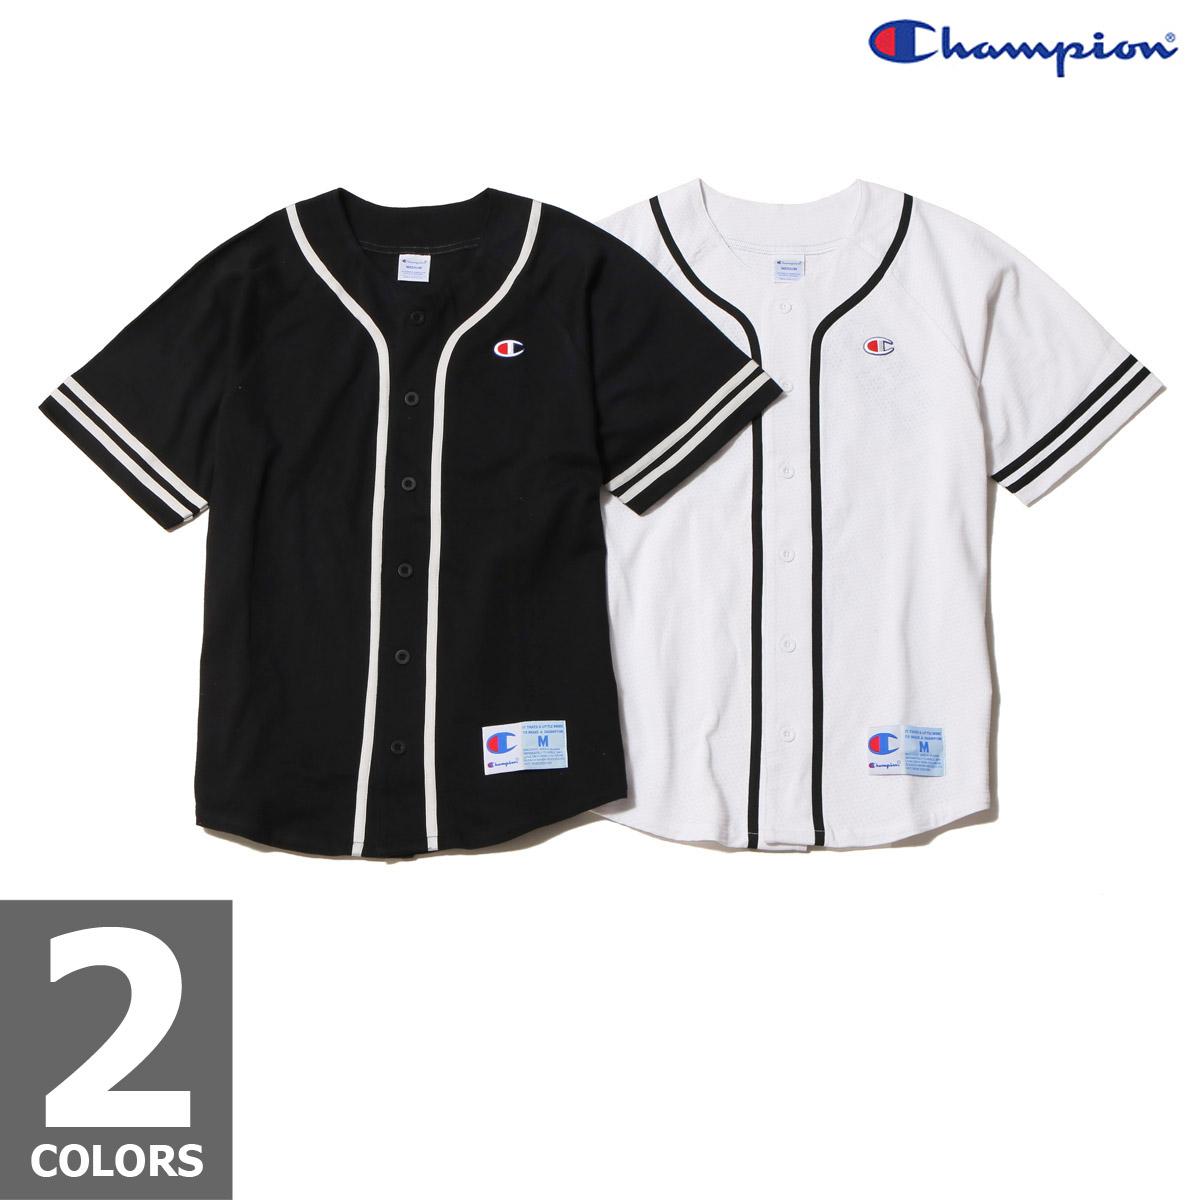 atmos pink champion baseball shirt champion baseball. Black Bedroom Furniture Sets. Home Design Ideas